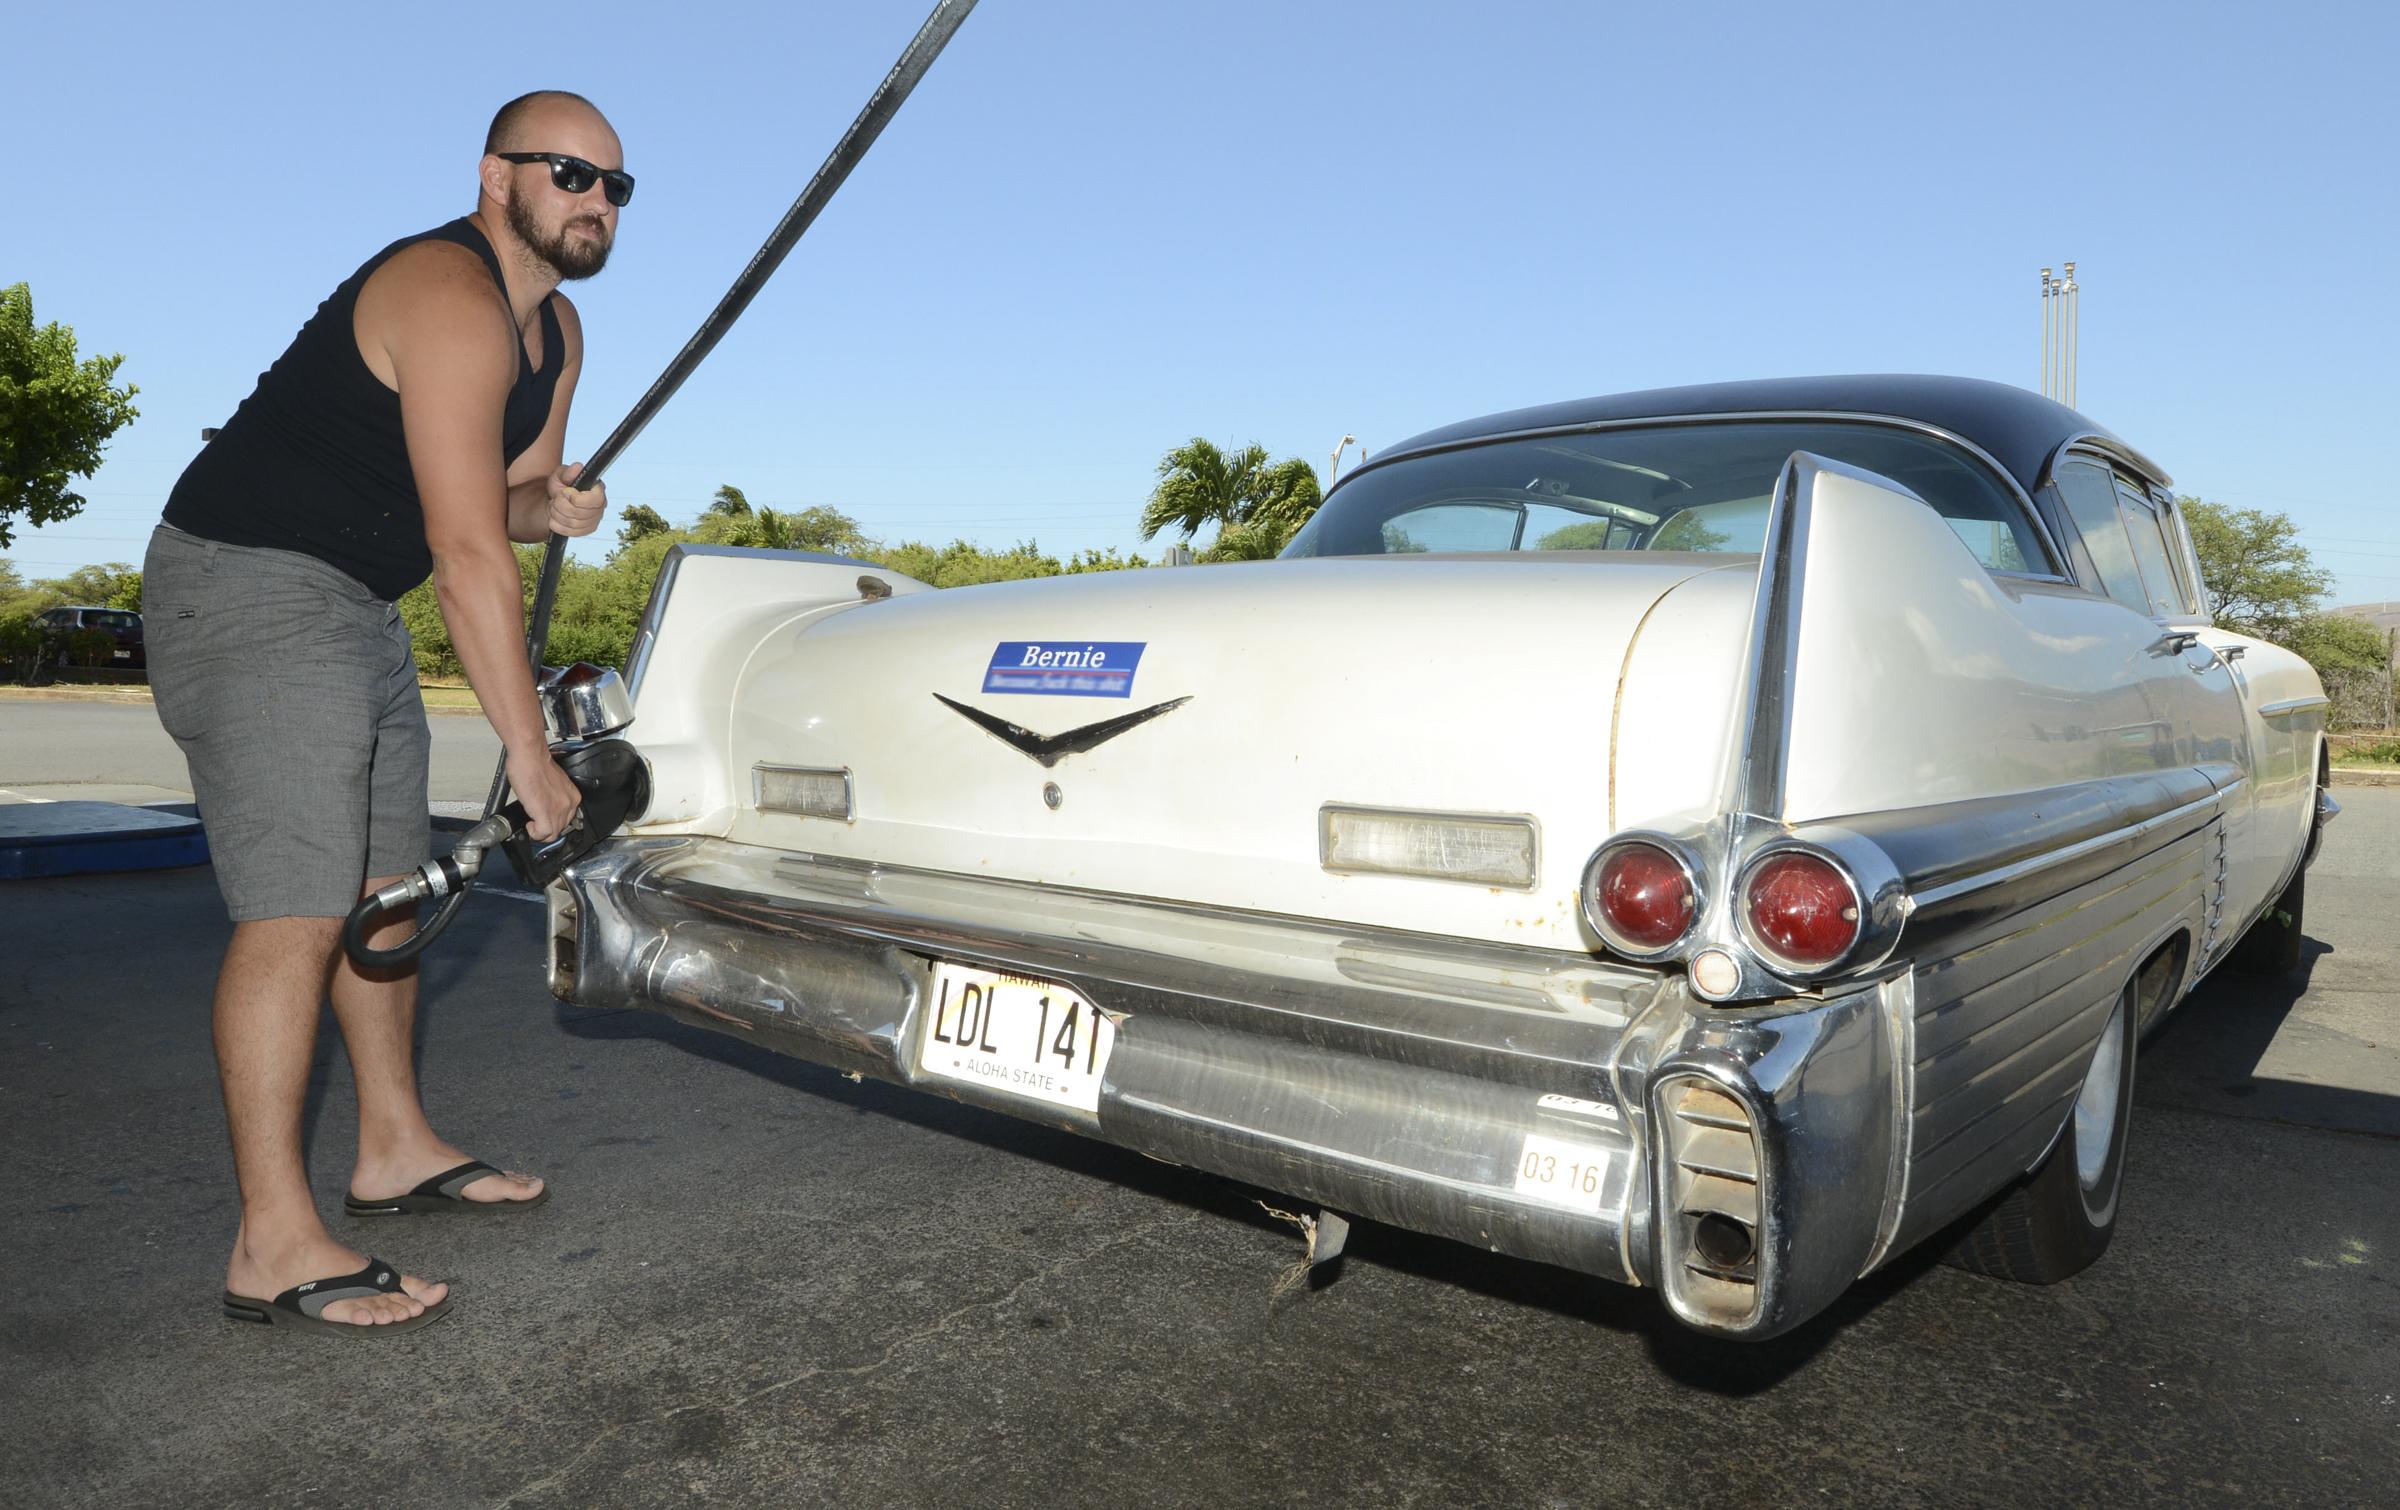 '57 Cadillac a gas guzzler but still a 'sweet ride' | News, Sports, Jobs - Maui News